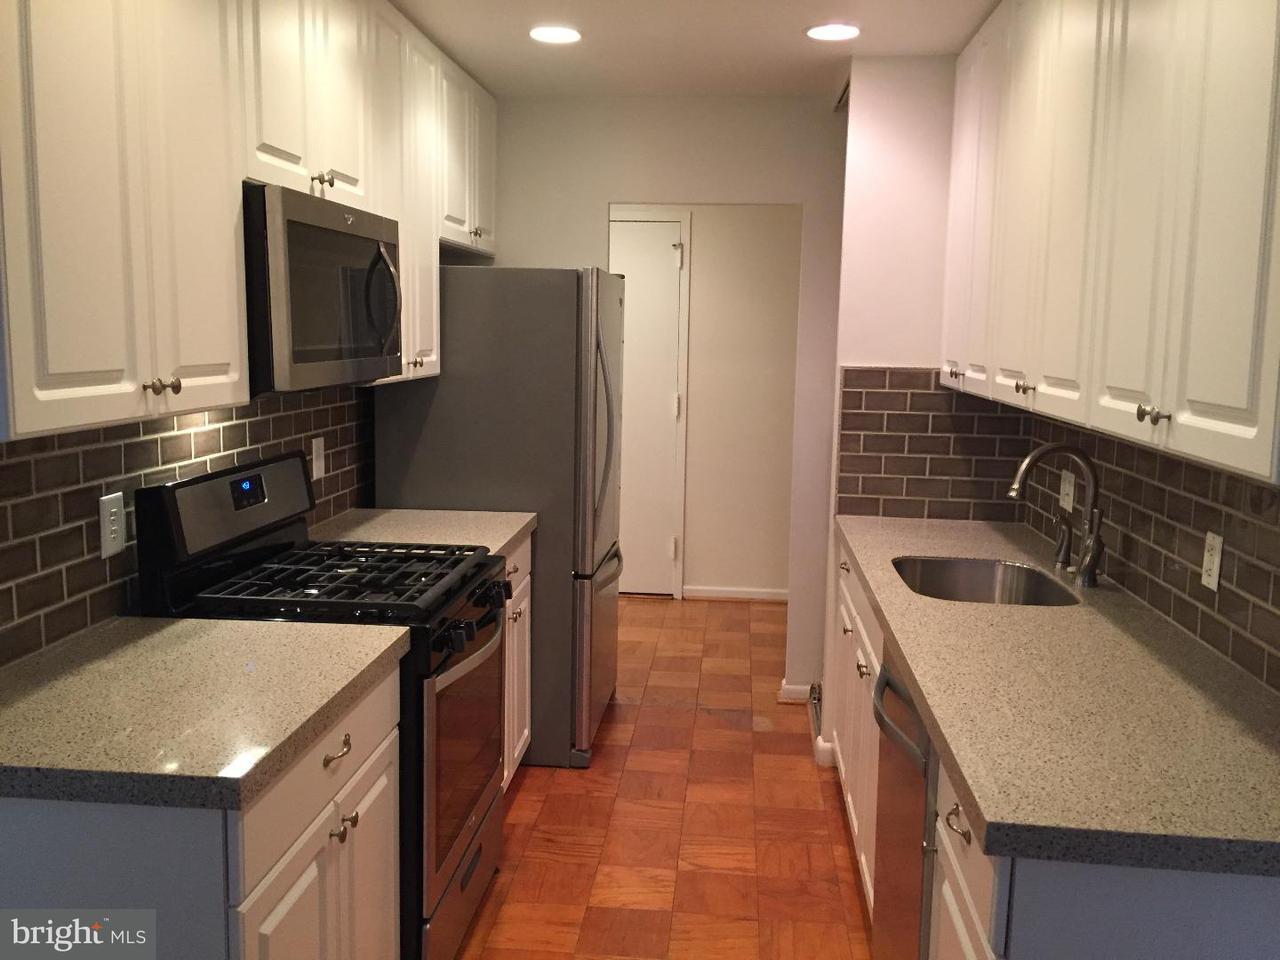 Condominium for Rent at 1640 OAKWOOD DR #W206 Narberth, Pennsylvania 19072 United States